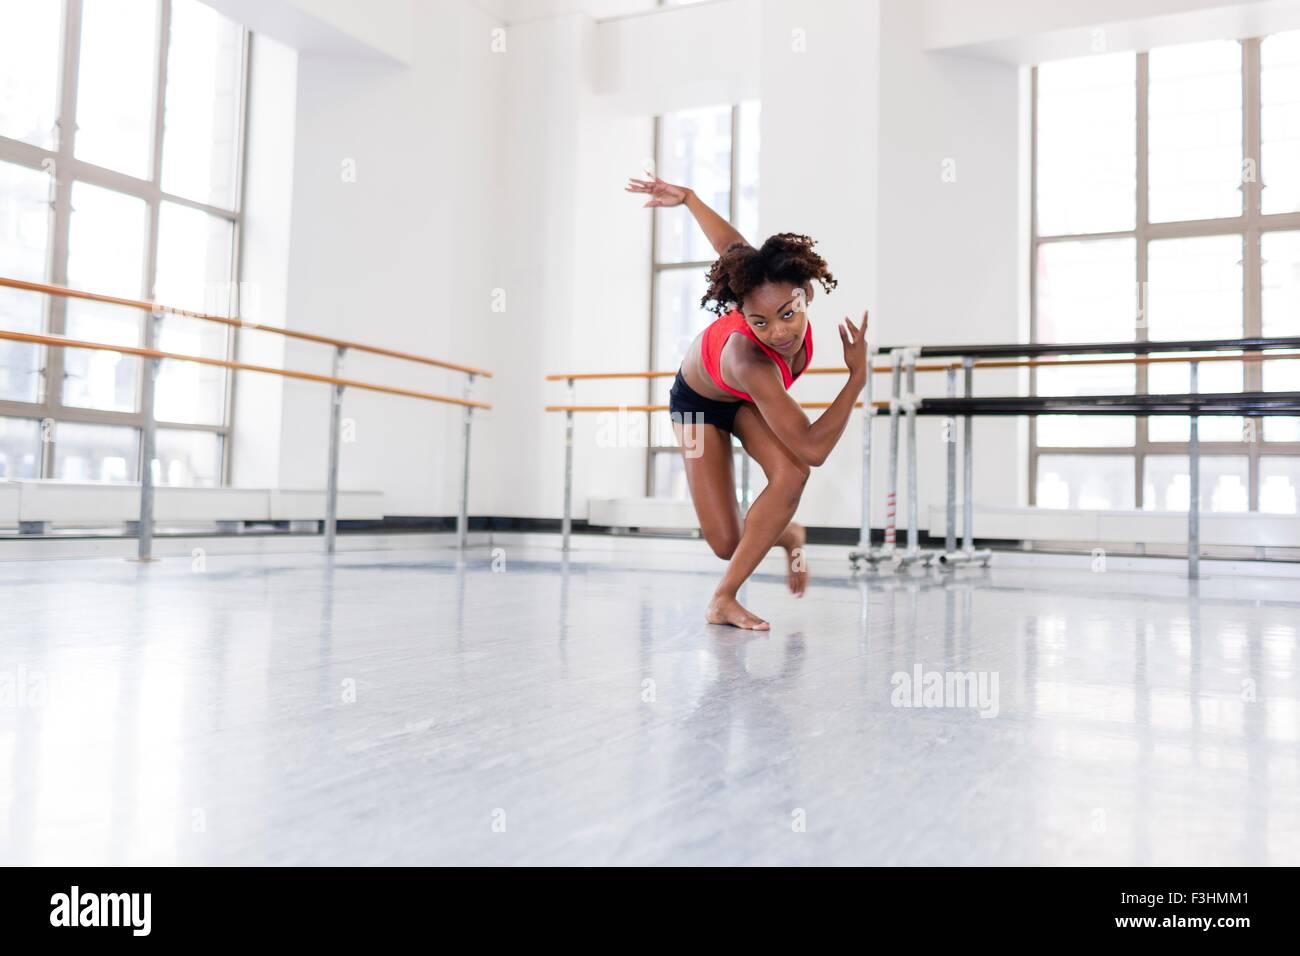 Junge Frau im Tanzstudio tanzen, Blick in die Kamera Stockbild